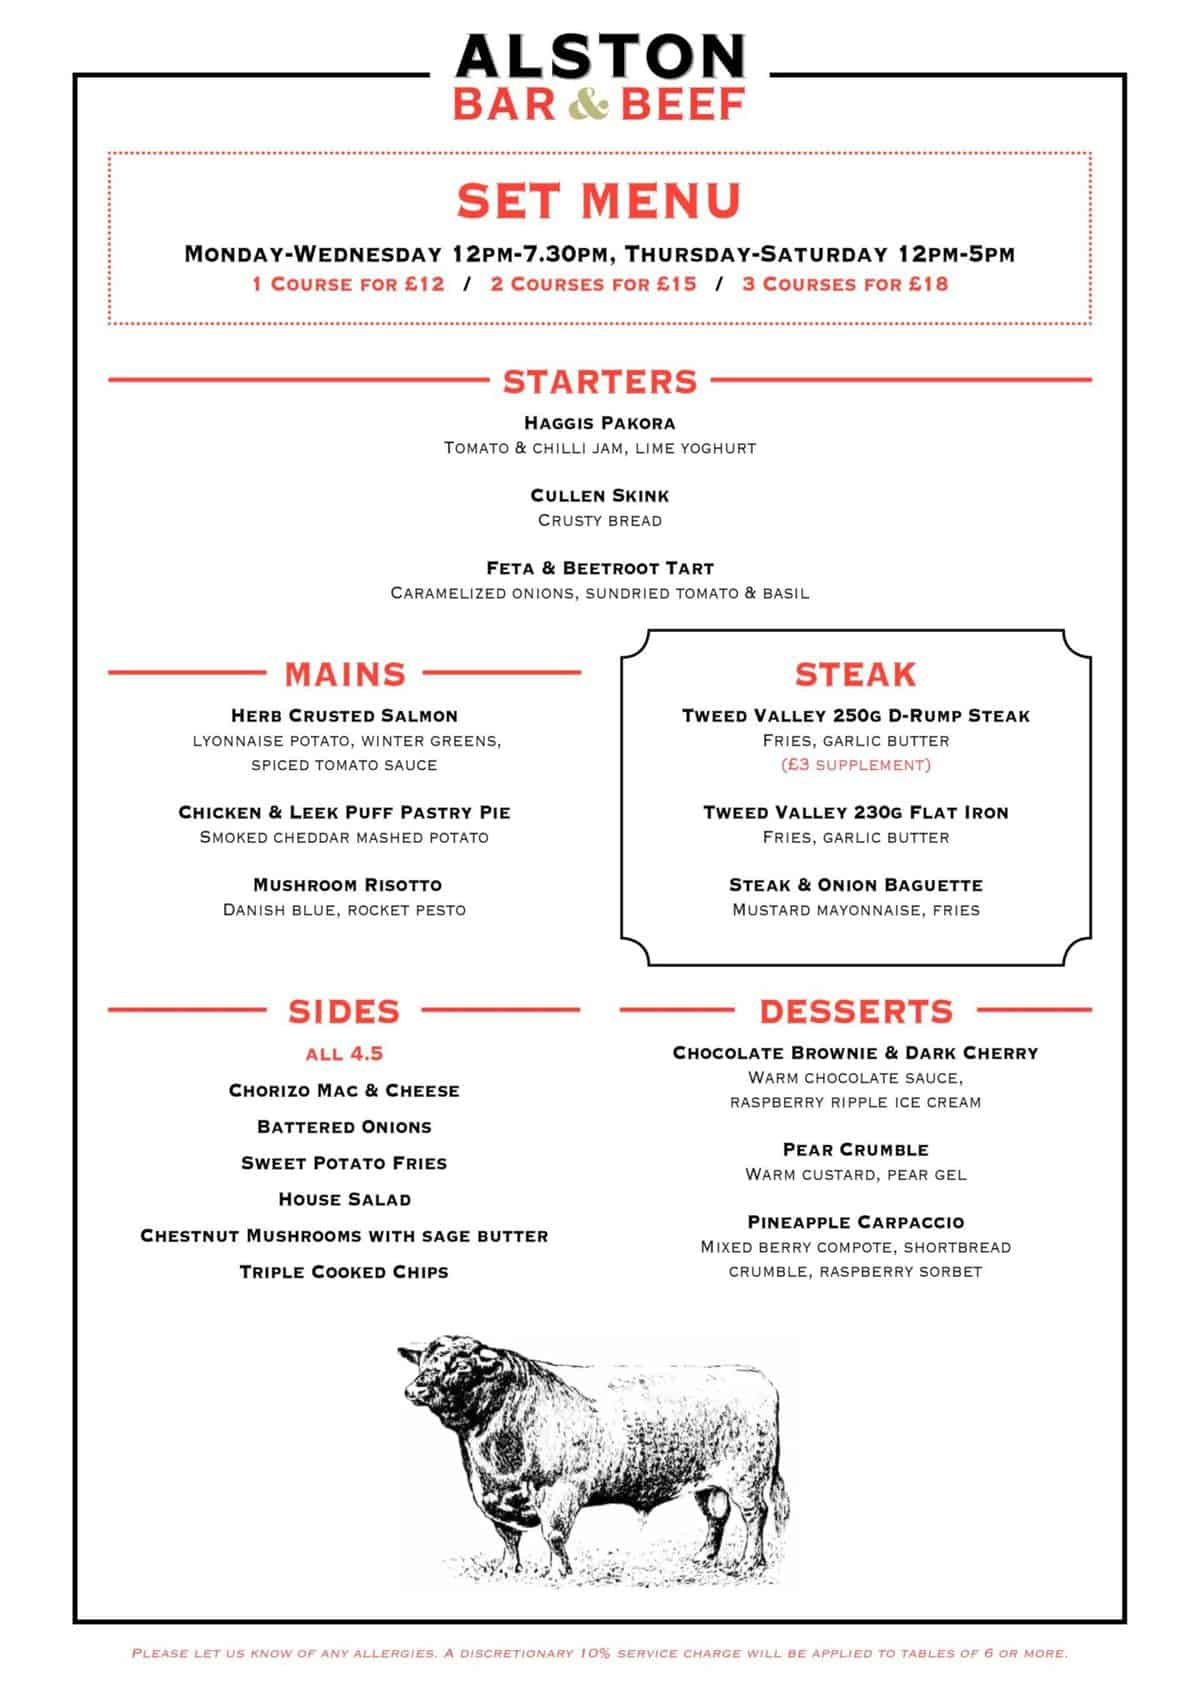 Alston bar and beef Glasgow set menu